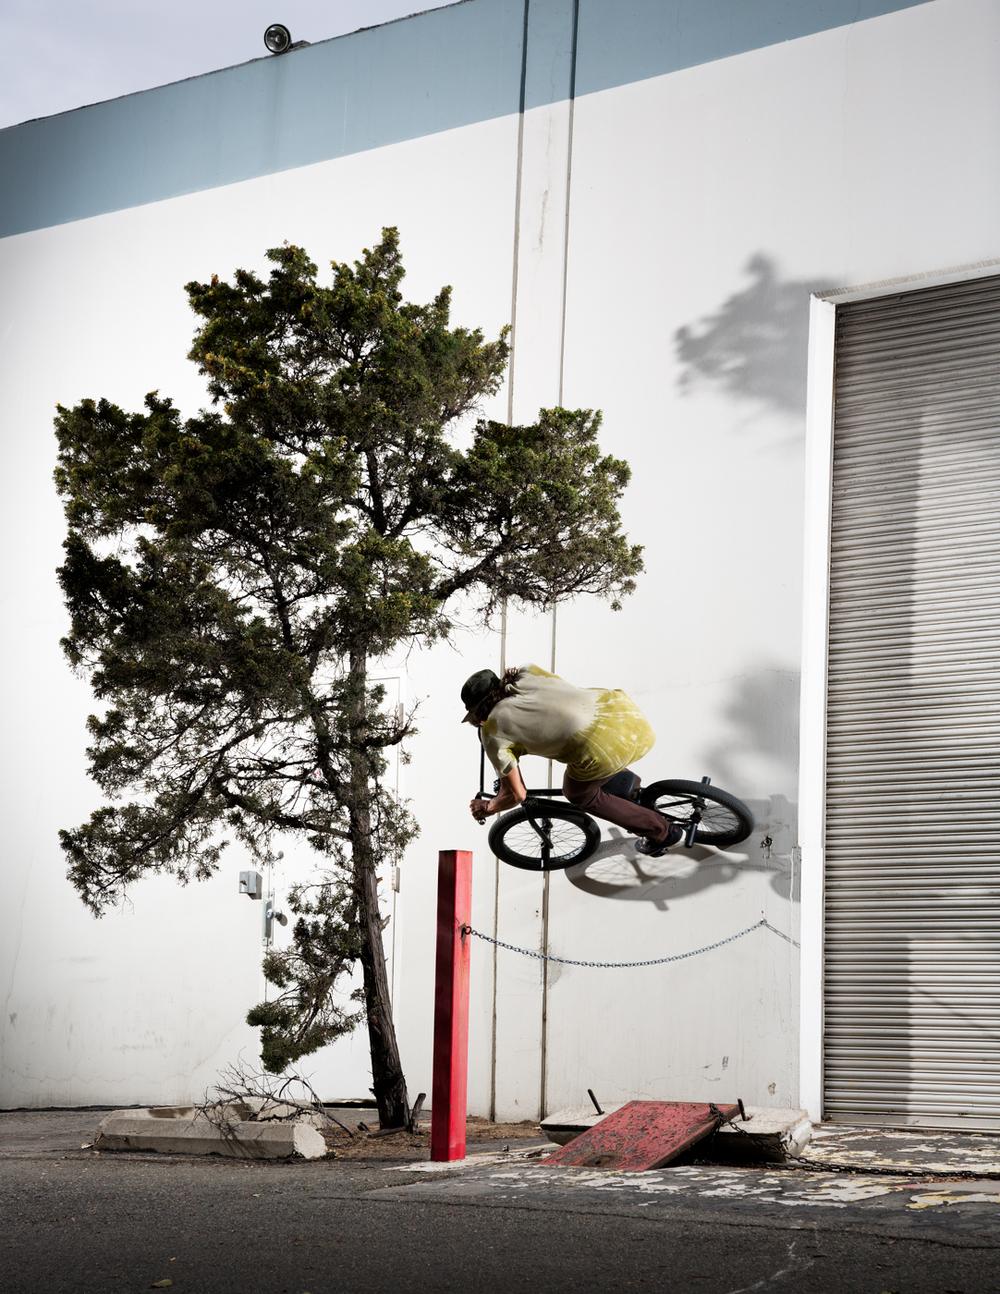 Mike Mastroni BMX Wallride